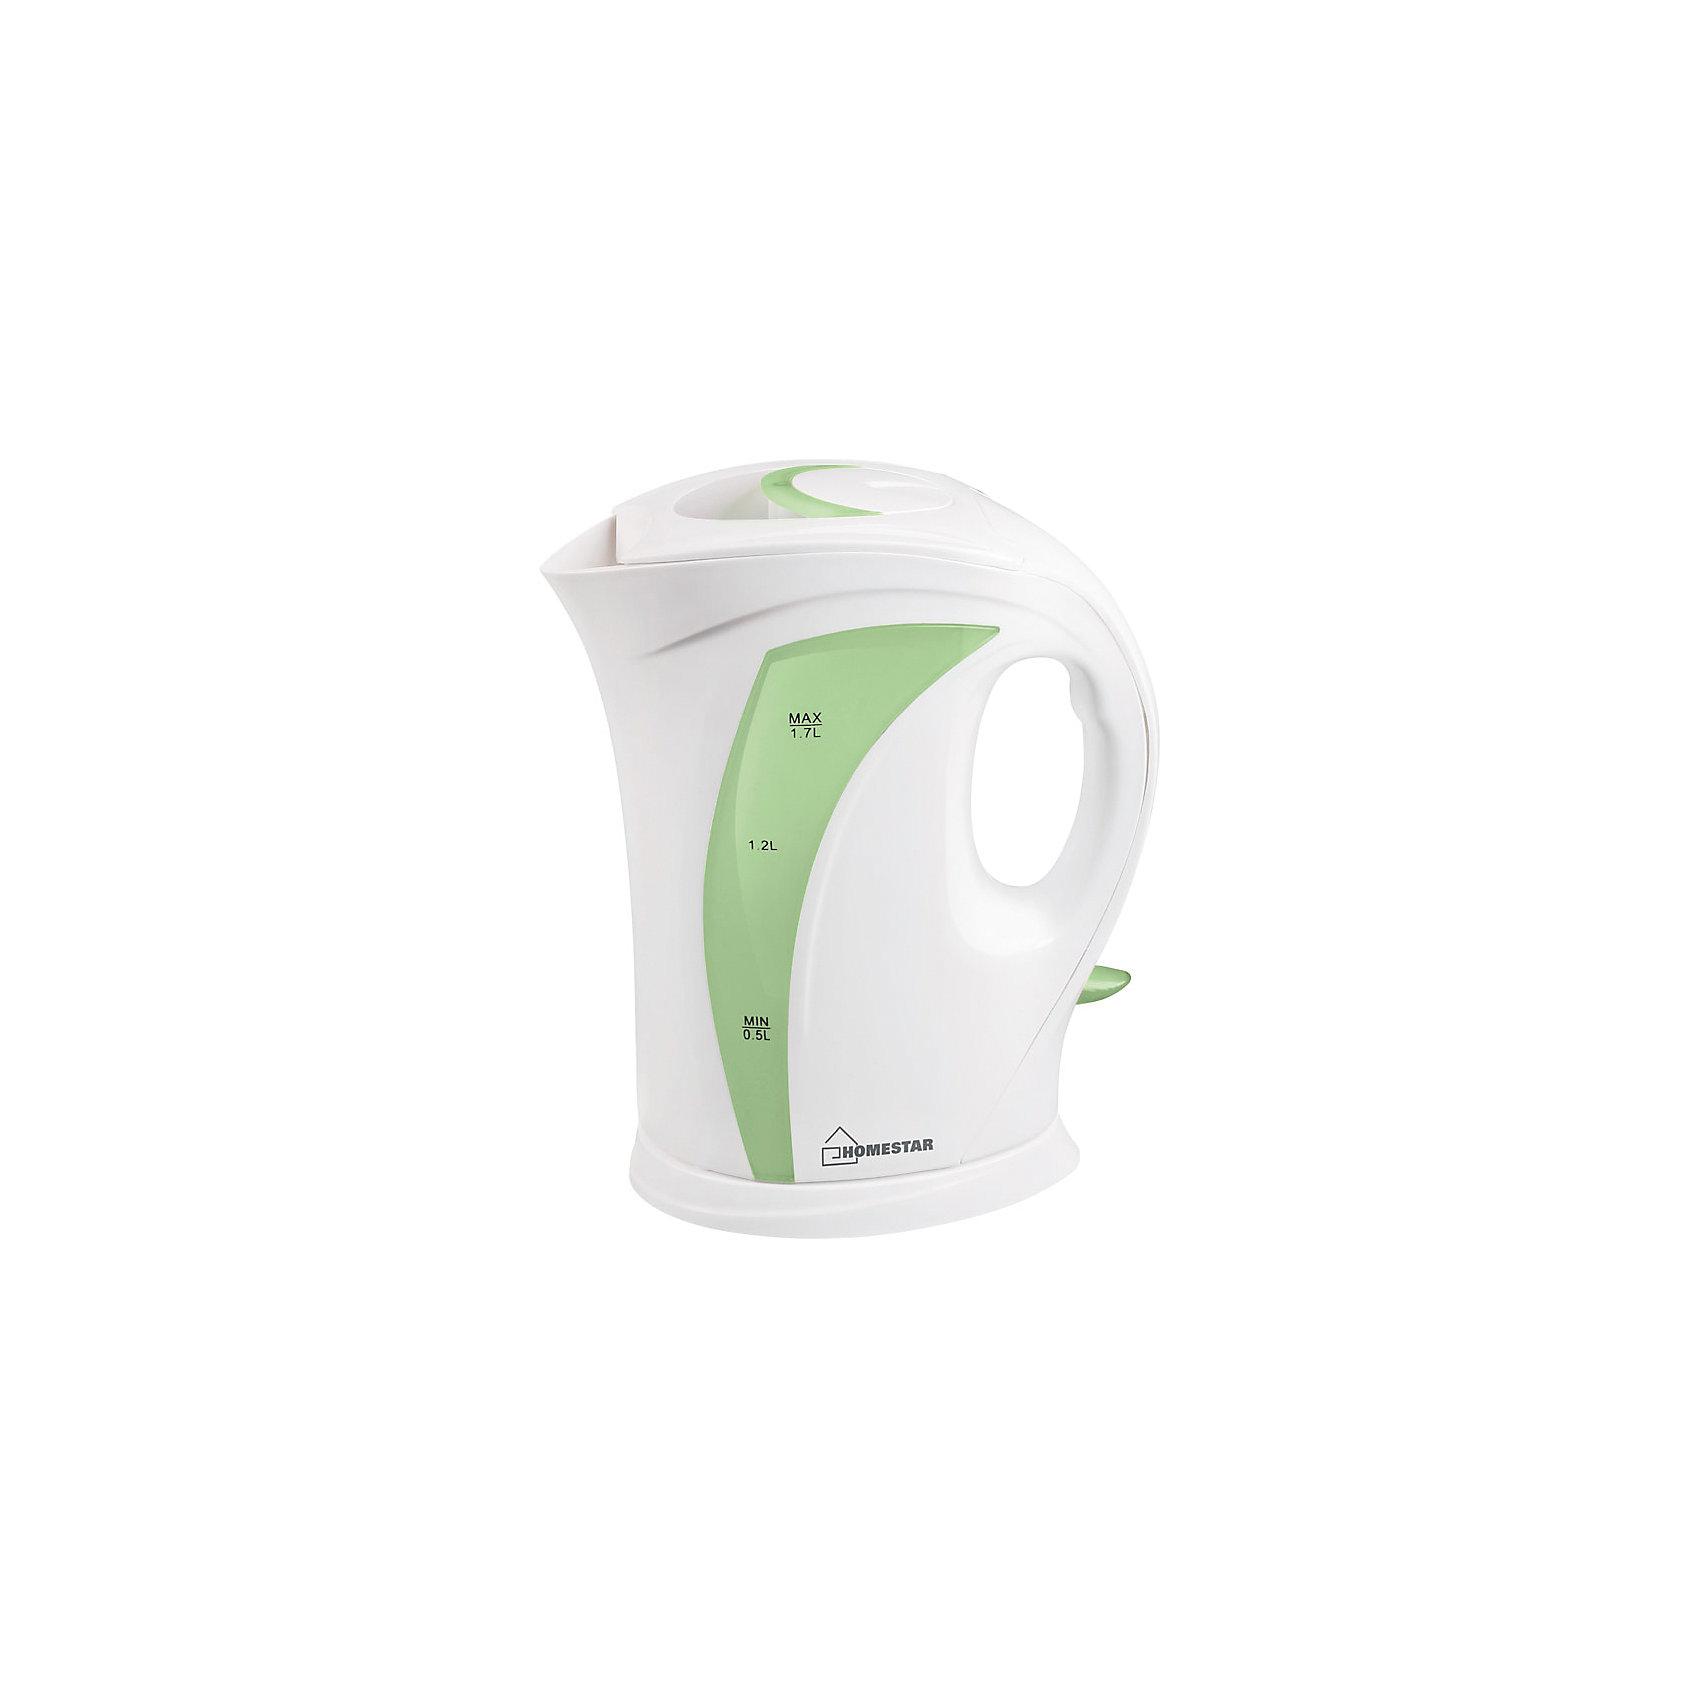 Чайник HS-1006 (1,7 л), HomeStar,  бело-зеленый